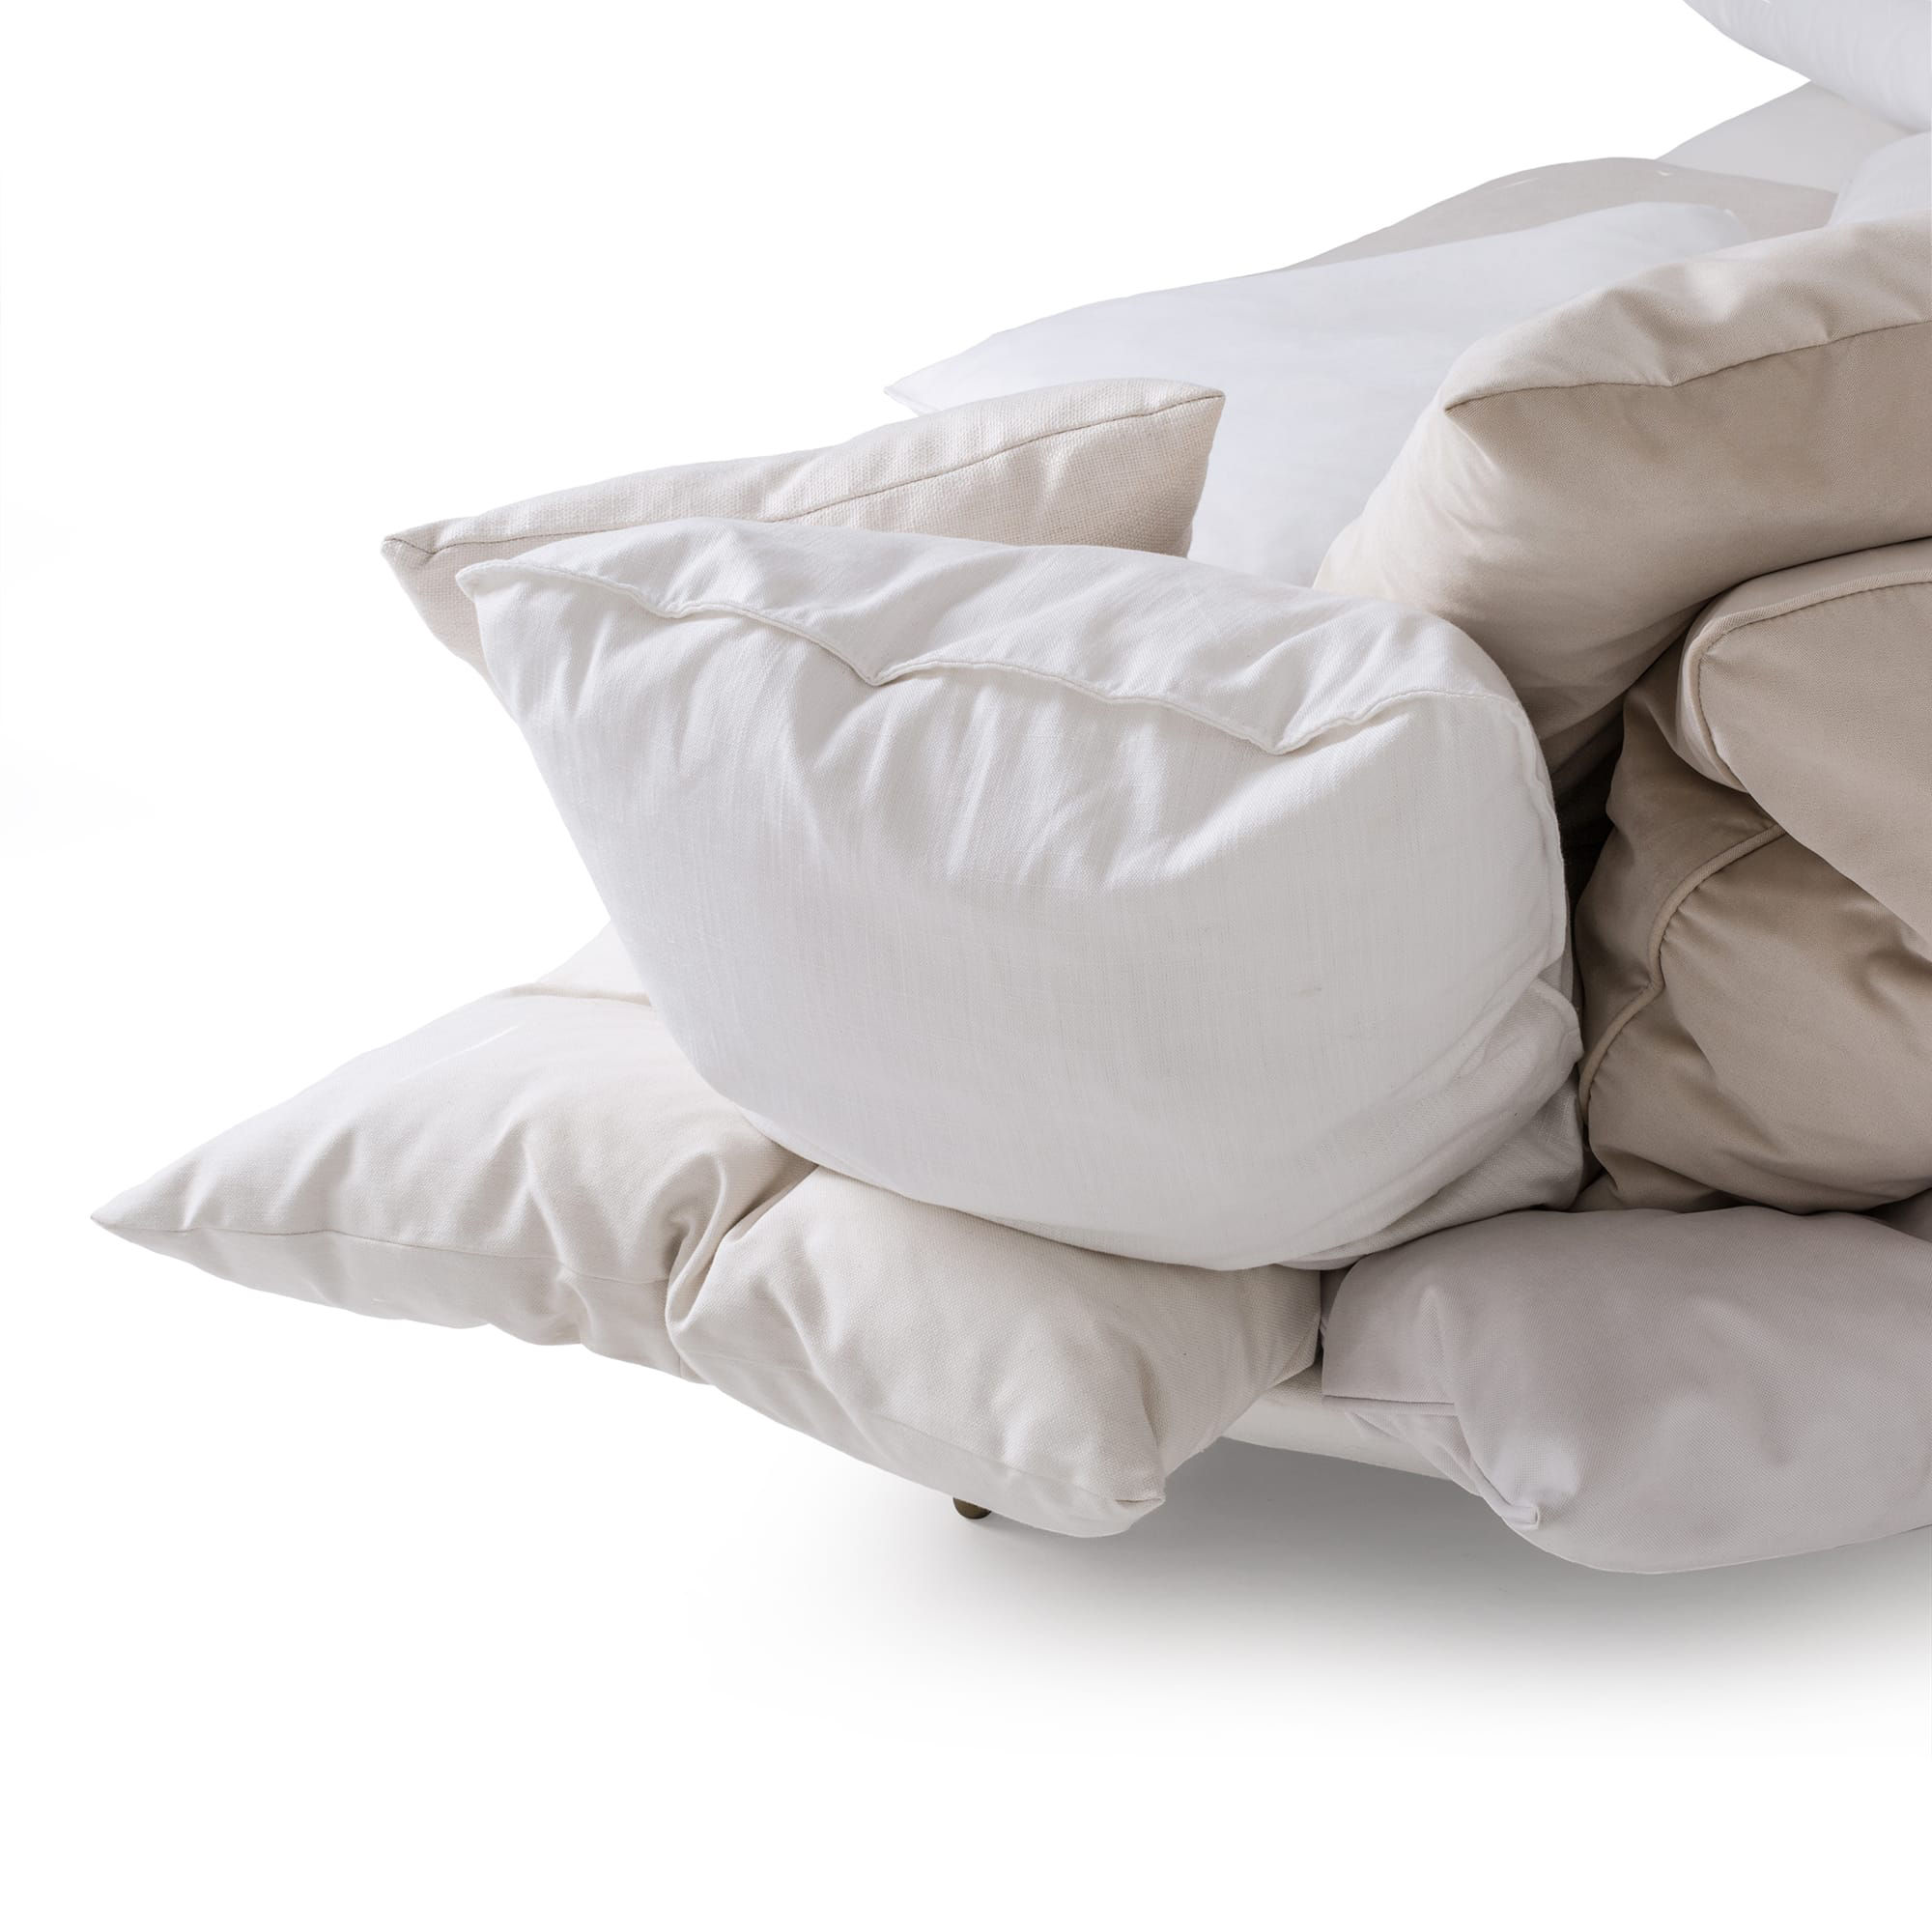 Sofa Comfy von Seletti - Weiß | Made In Design